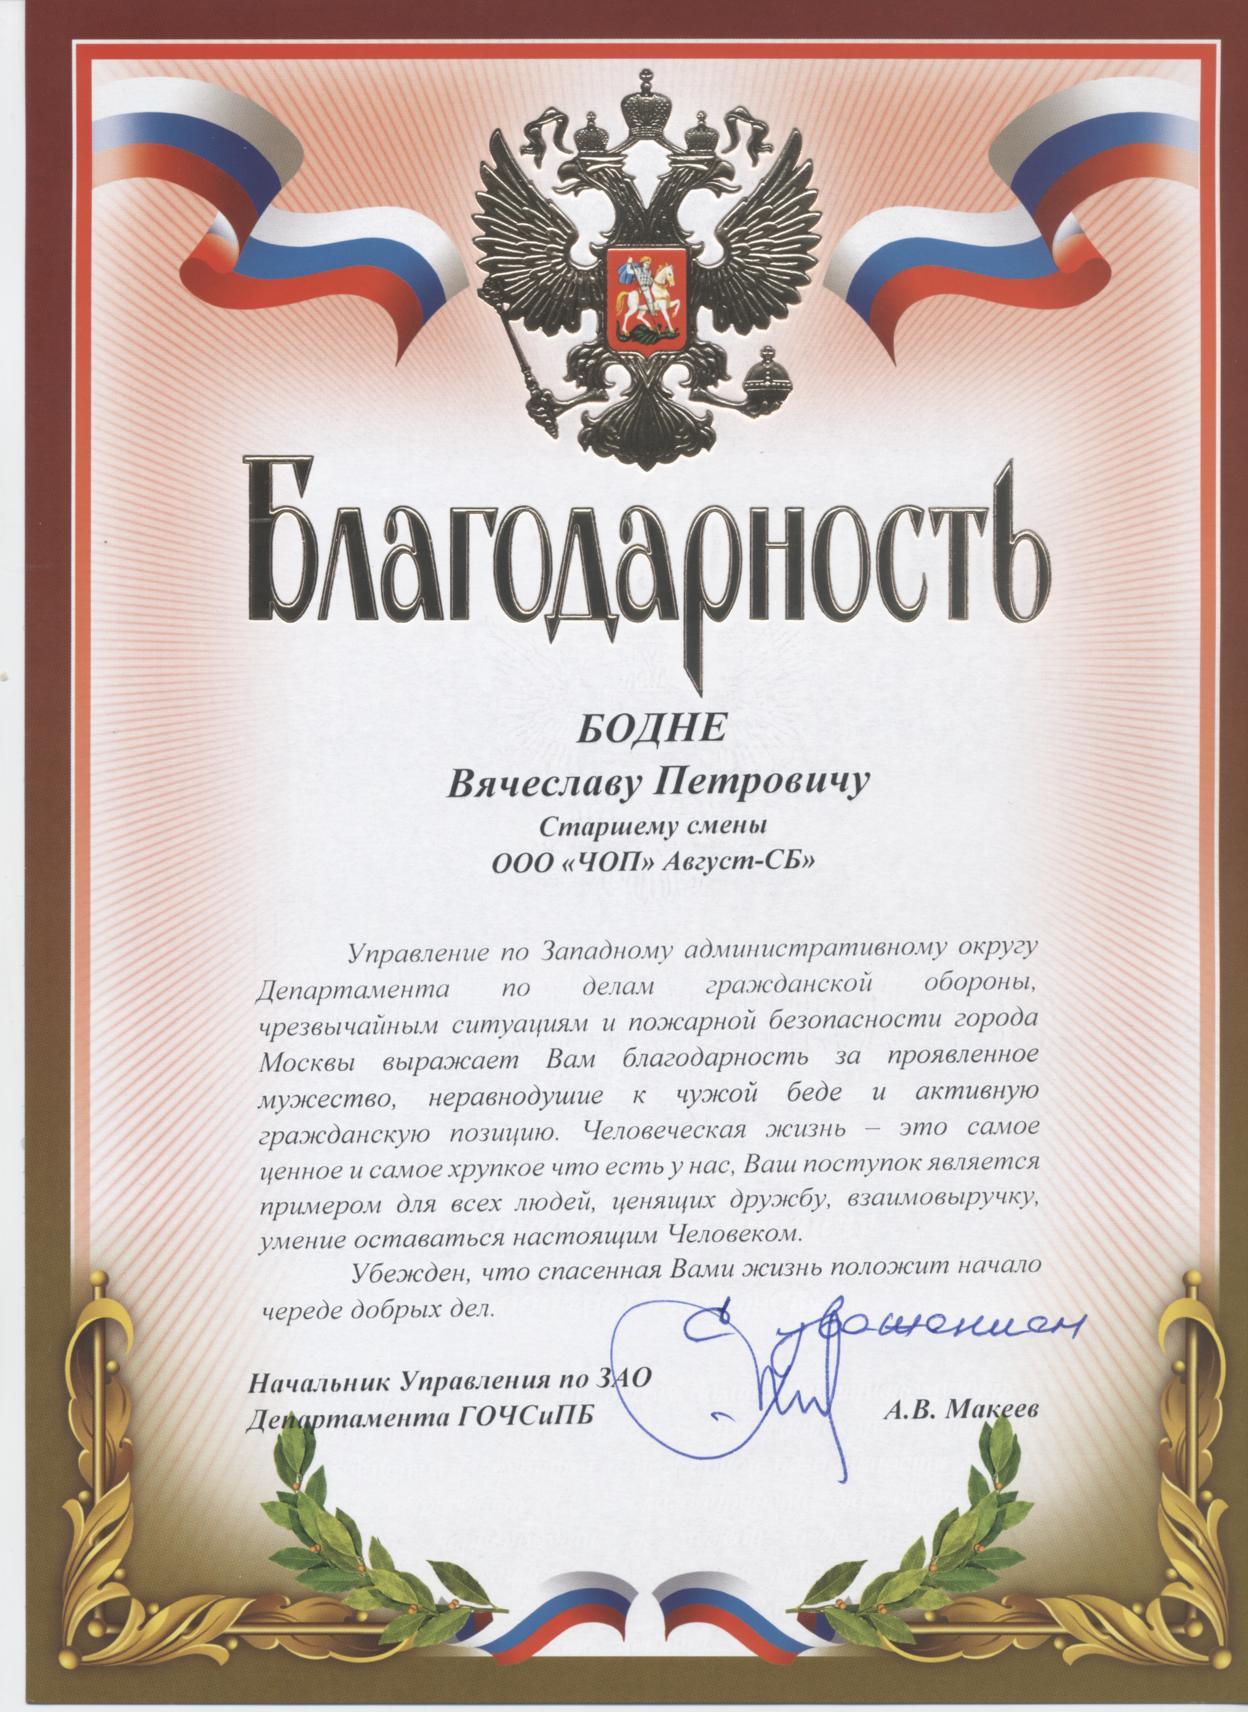 Благодарность сотруднику ООО ЧОП АВГУСТ СБ